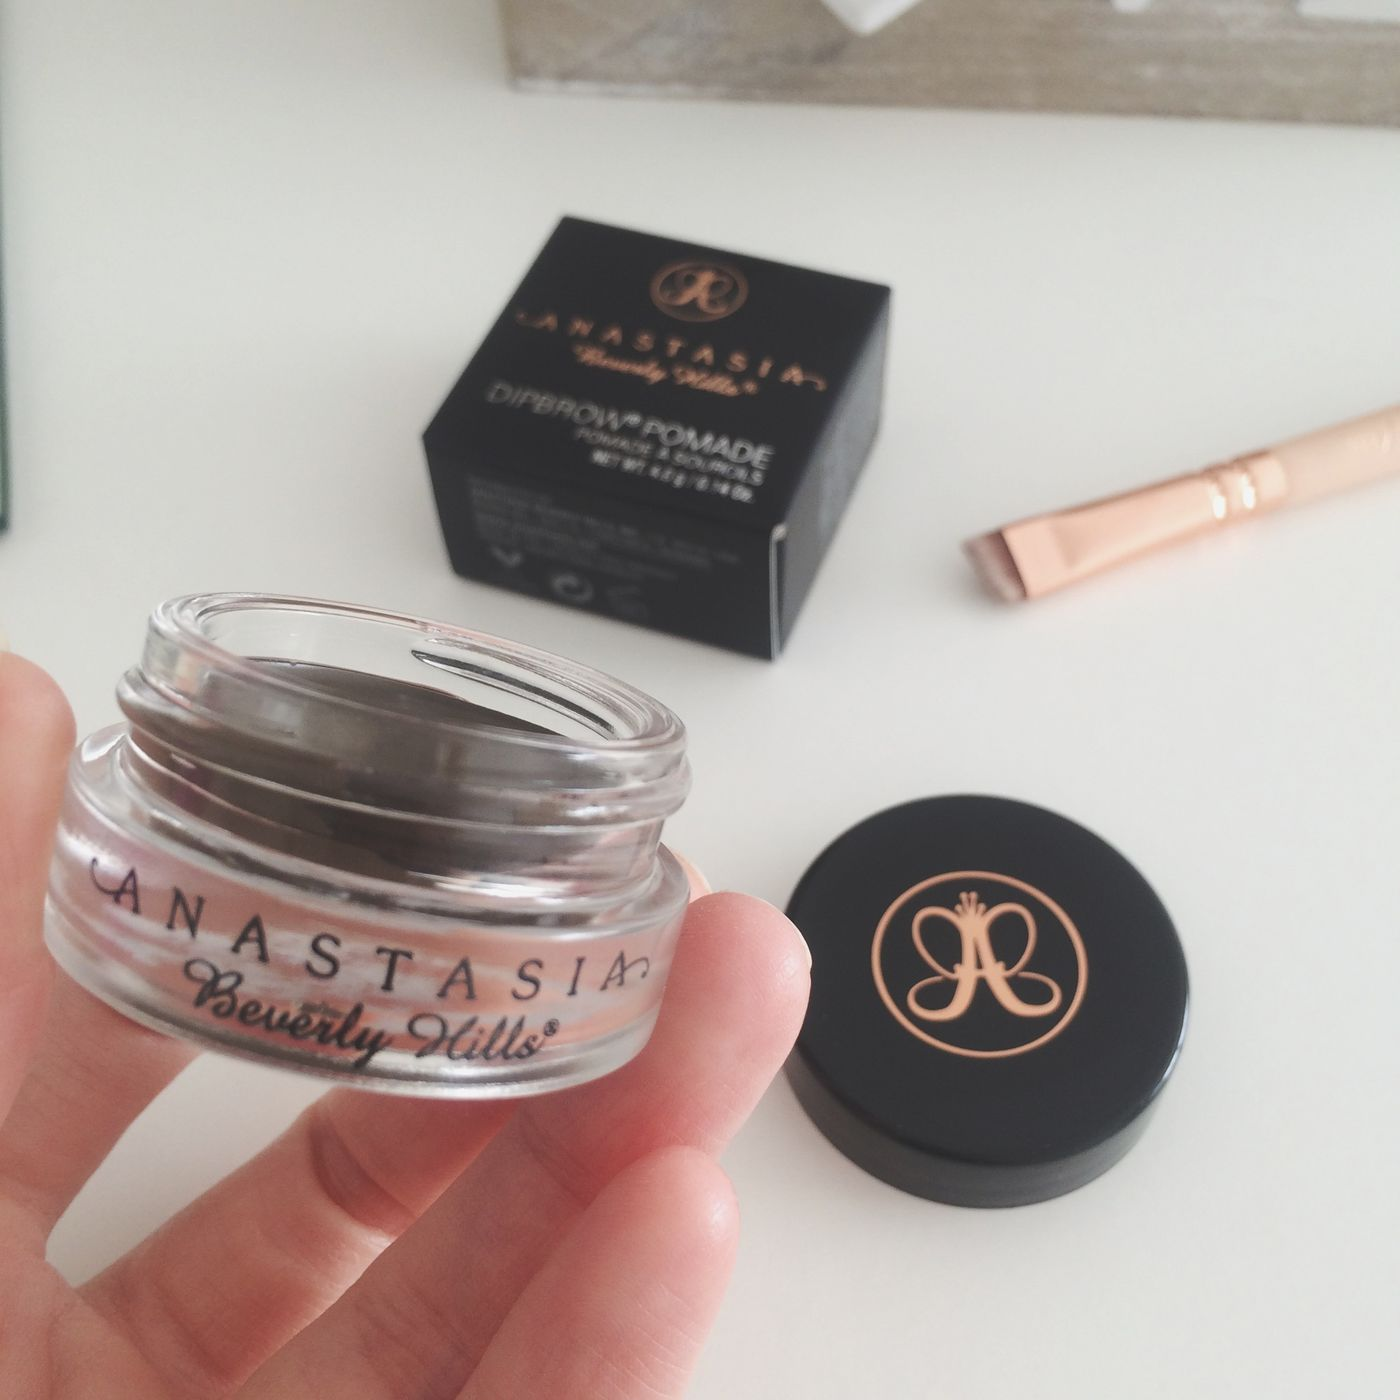 Anastasiabeverlyhills Dipbrowpomade Eyebrow Makeup